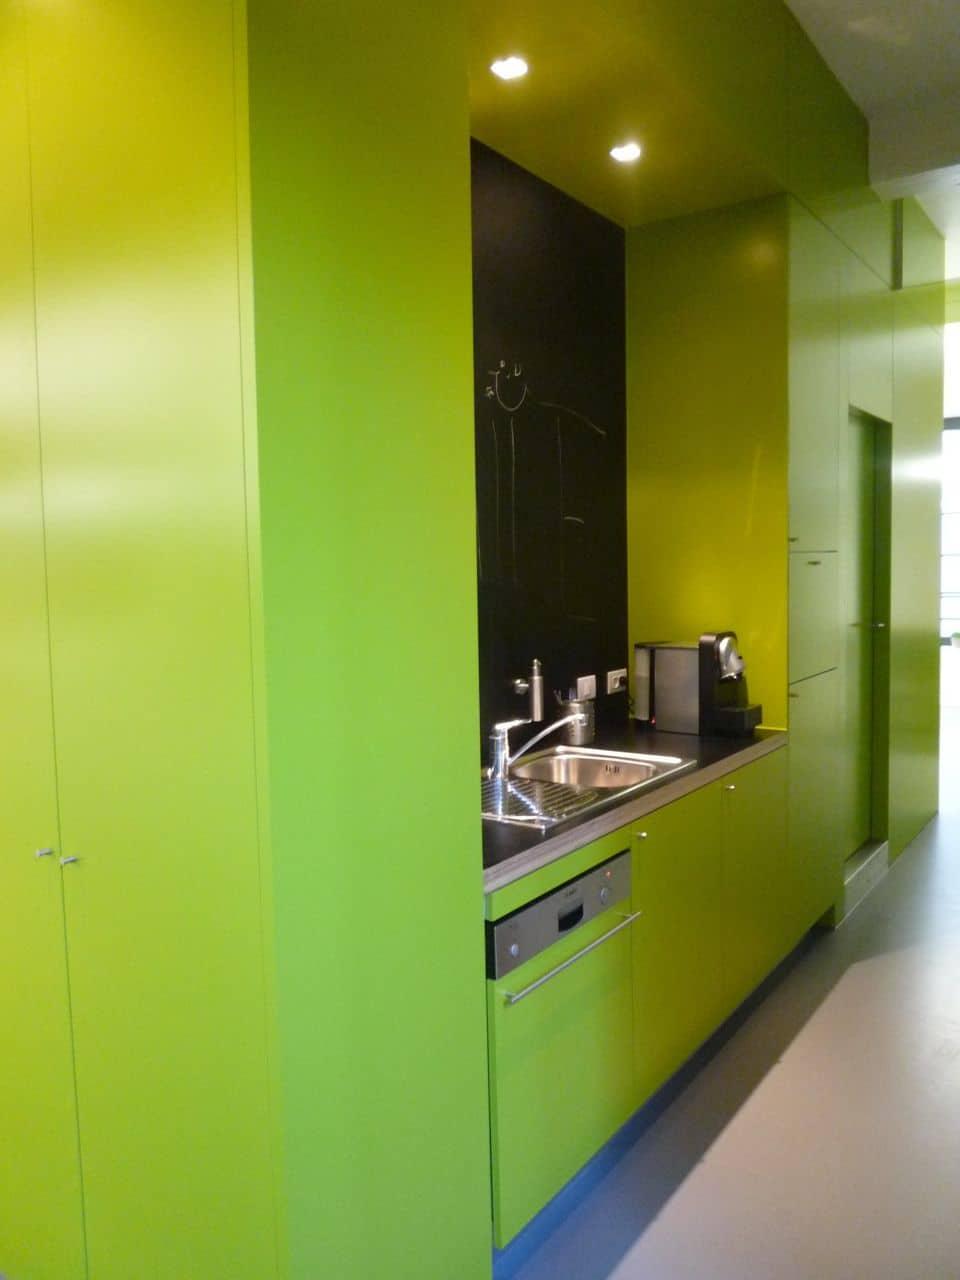 P1060713 | Baeyens & Beck architecten Gent | architect nieuwbouw renovatie interieur | high end | architectenbureau